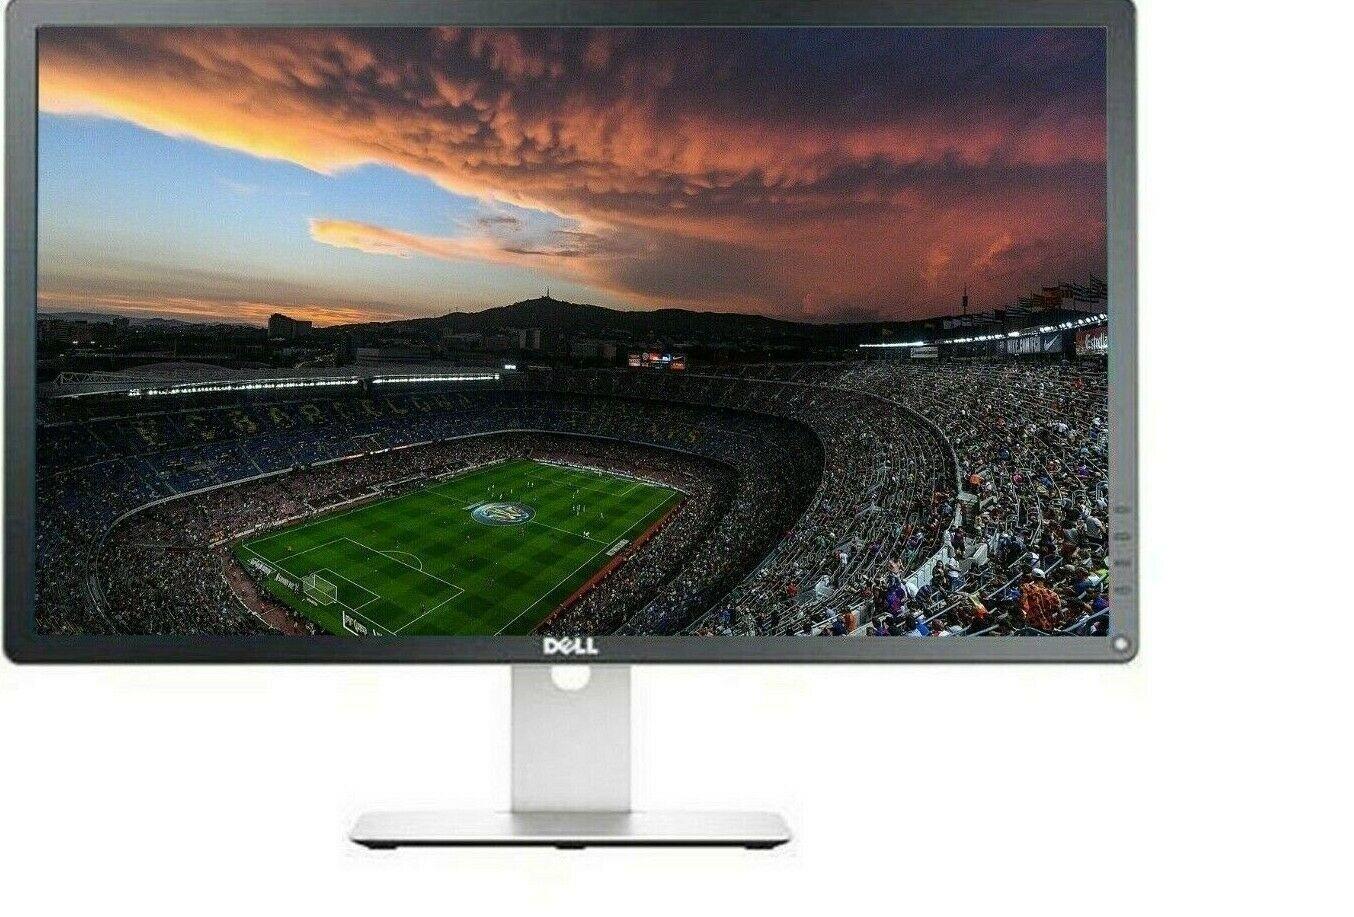 Dell P2214HB 22″ 1920×1080 FHD Widescreen LED Monitor VGA, DVI and DisplayPort